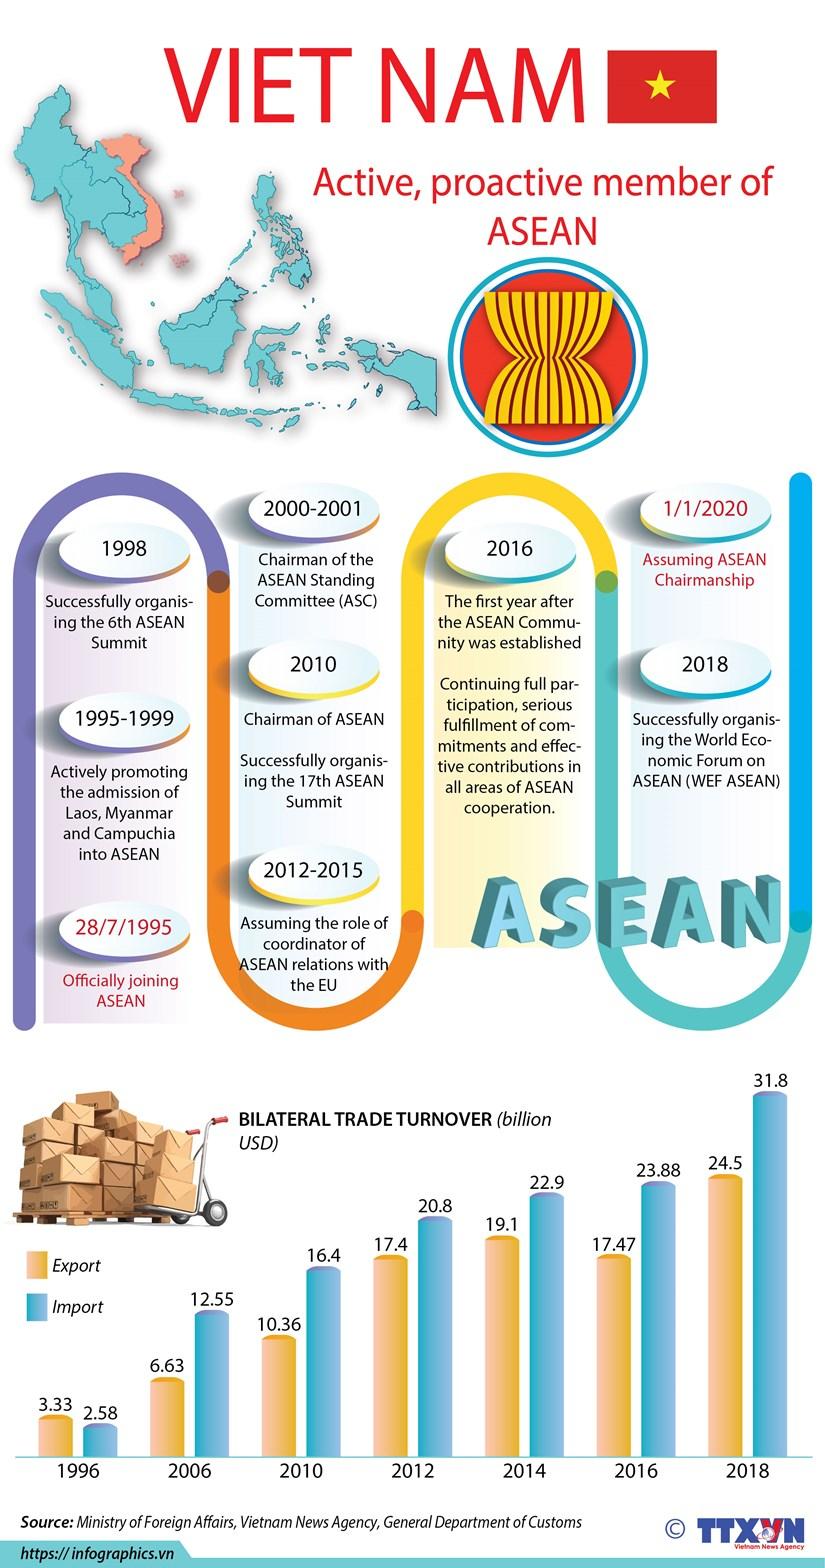 Vietnam - an active, proactive member of ASEAN hinh anh 1